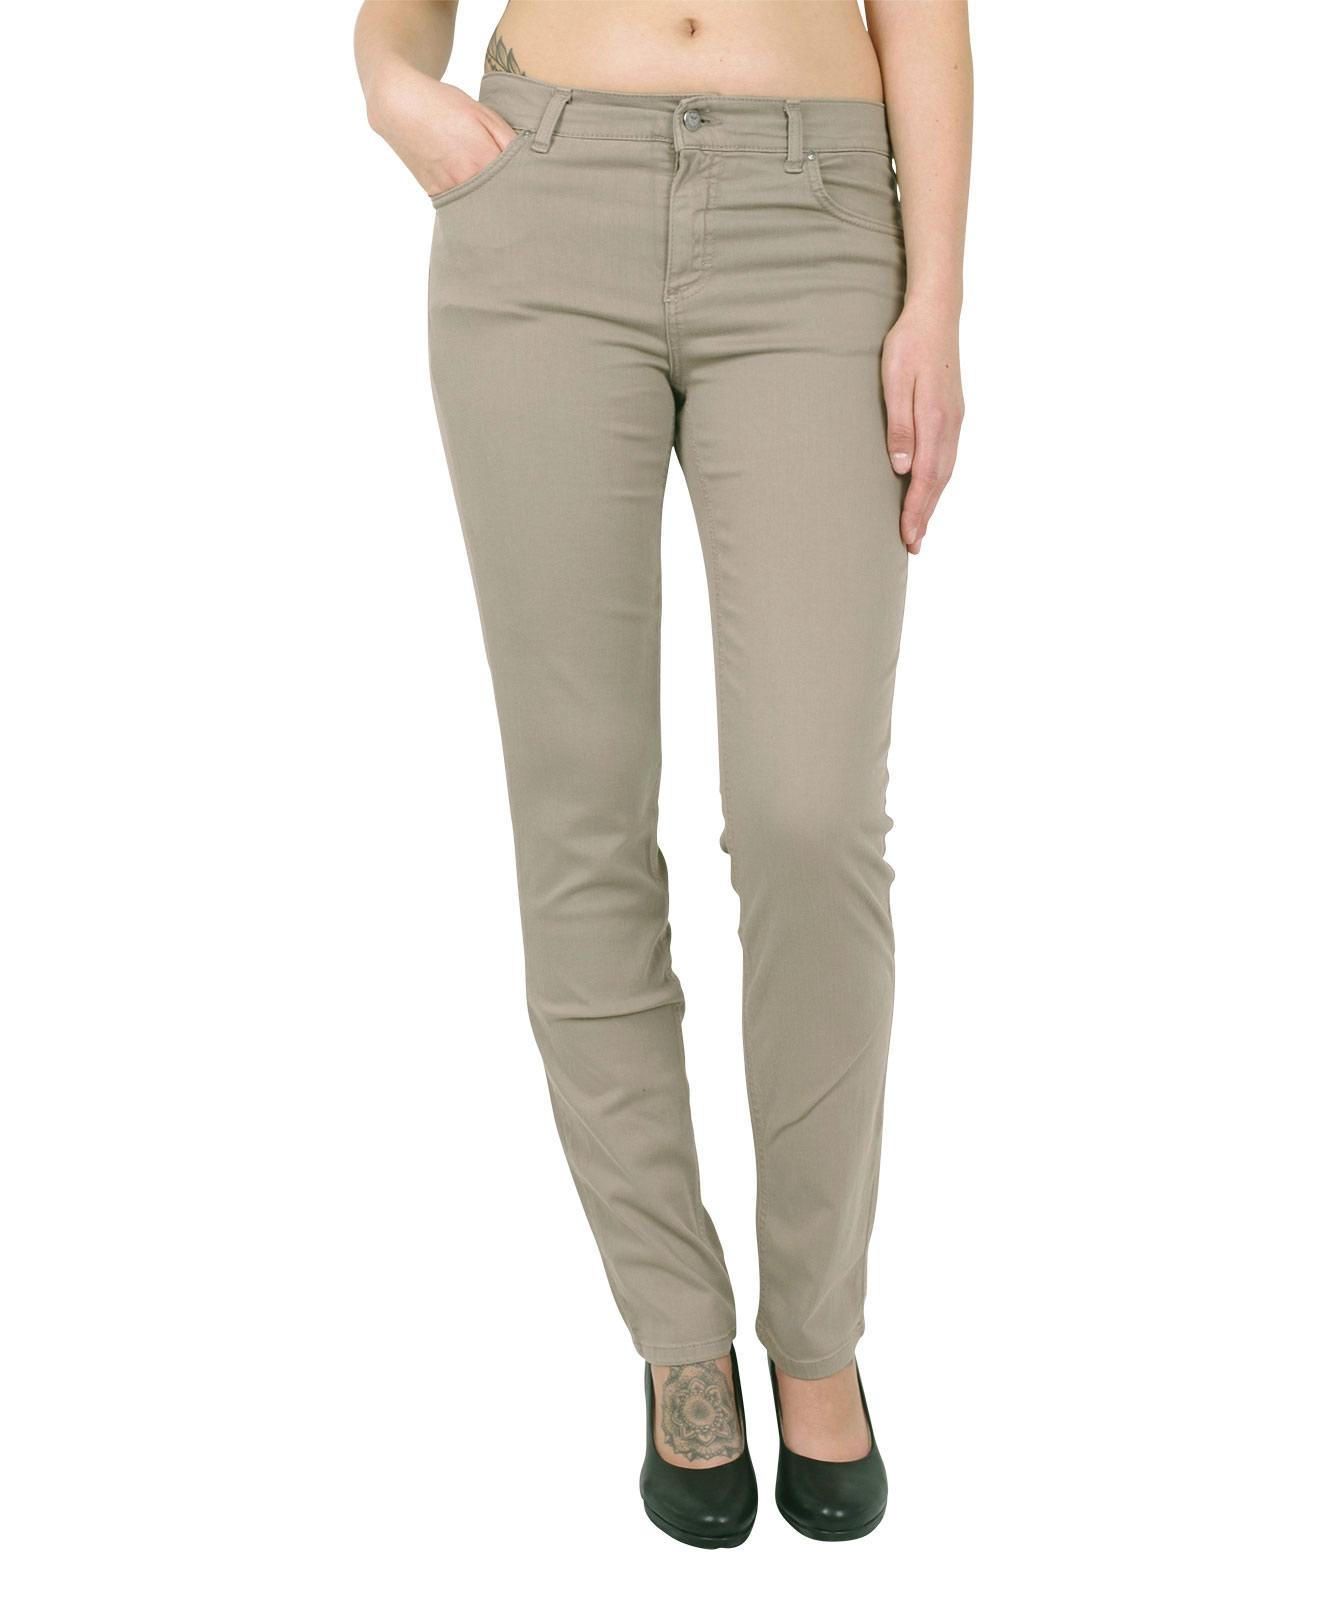 Hosen - Angels Straight Leg Jeans Cici in Dark Kitt  - Onlineshop Jeans Meile